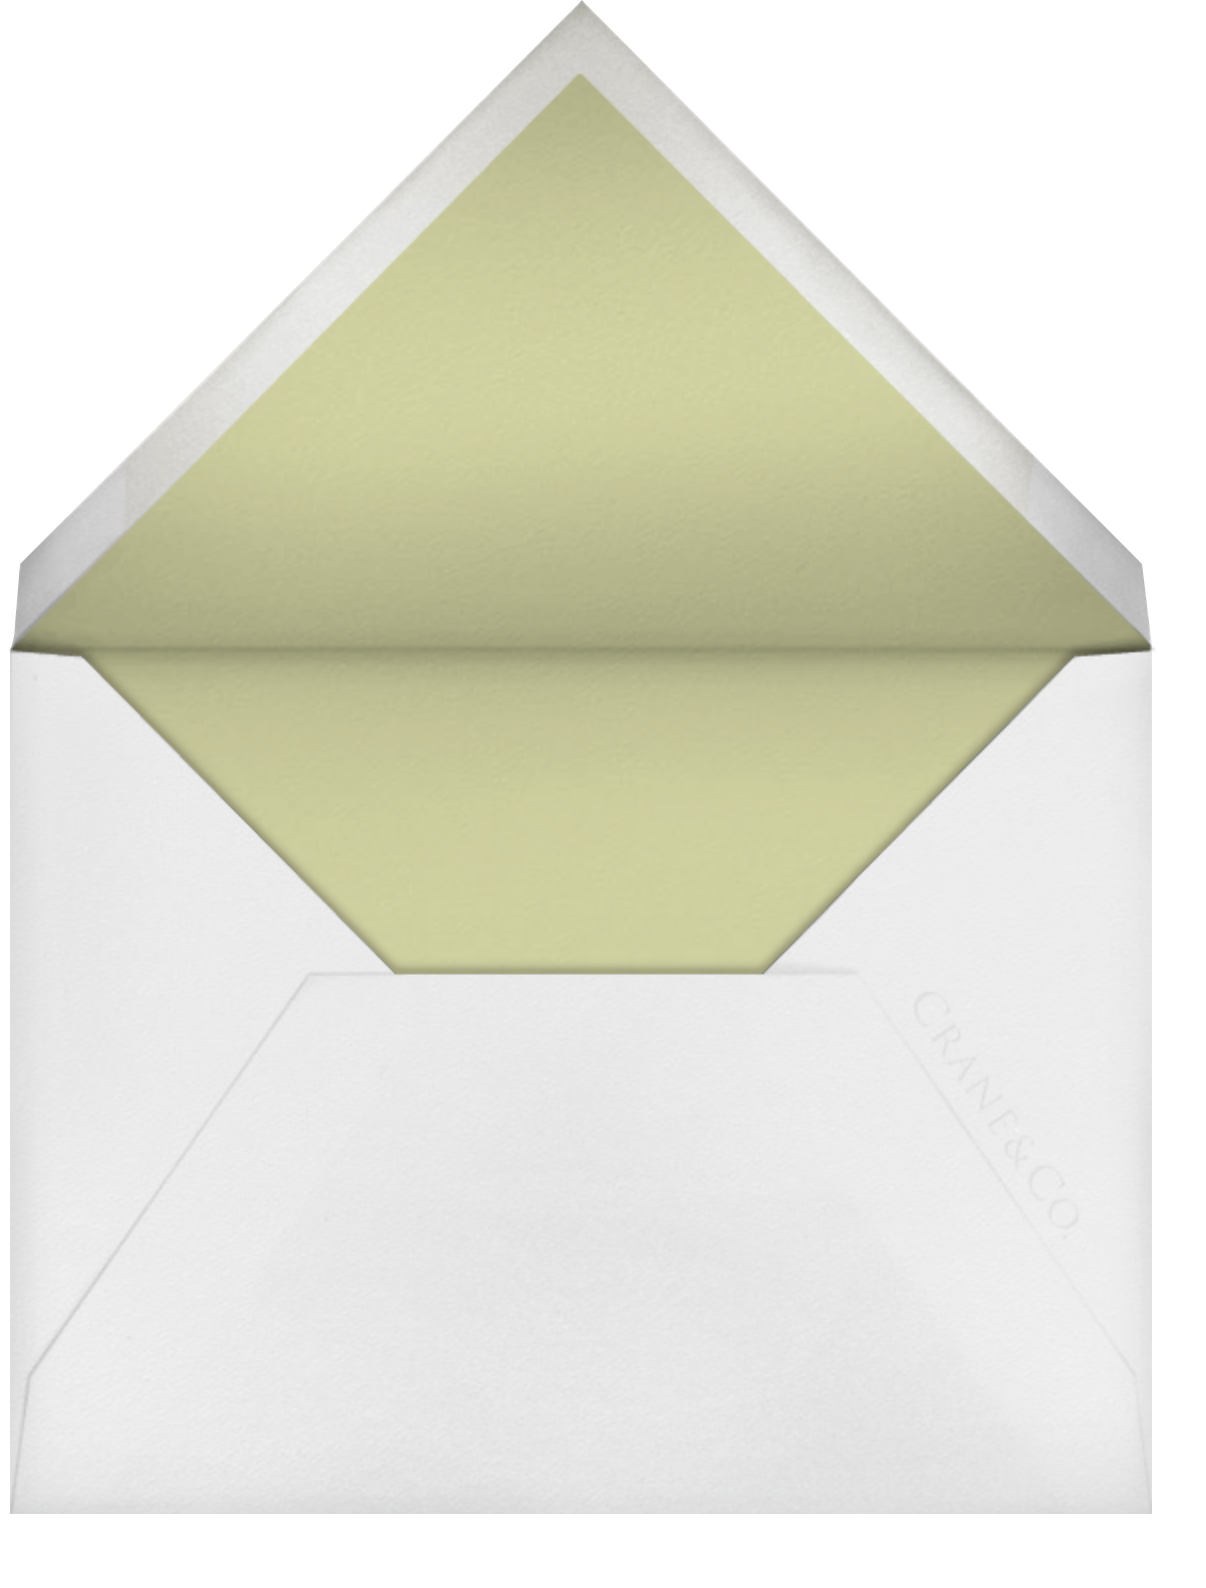 Gwendolyn I - Celery - Paperless Post - All - envelope back